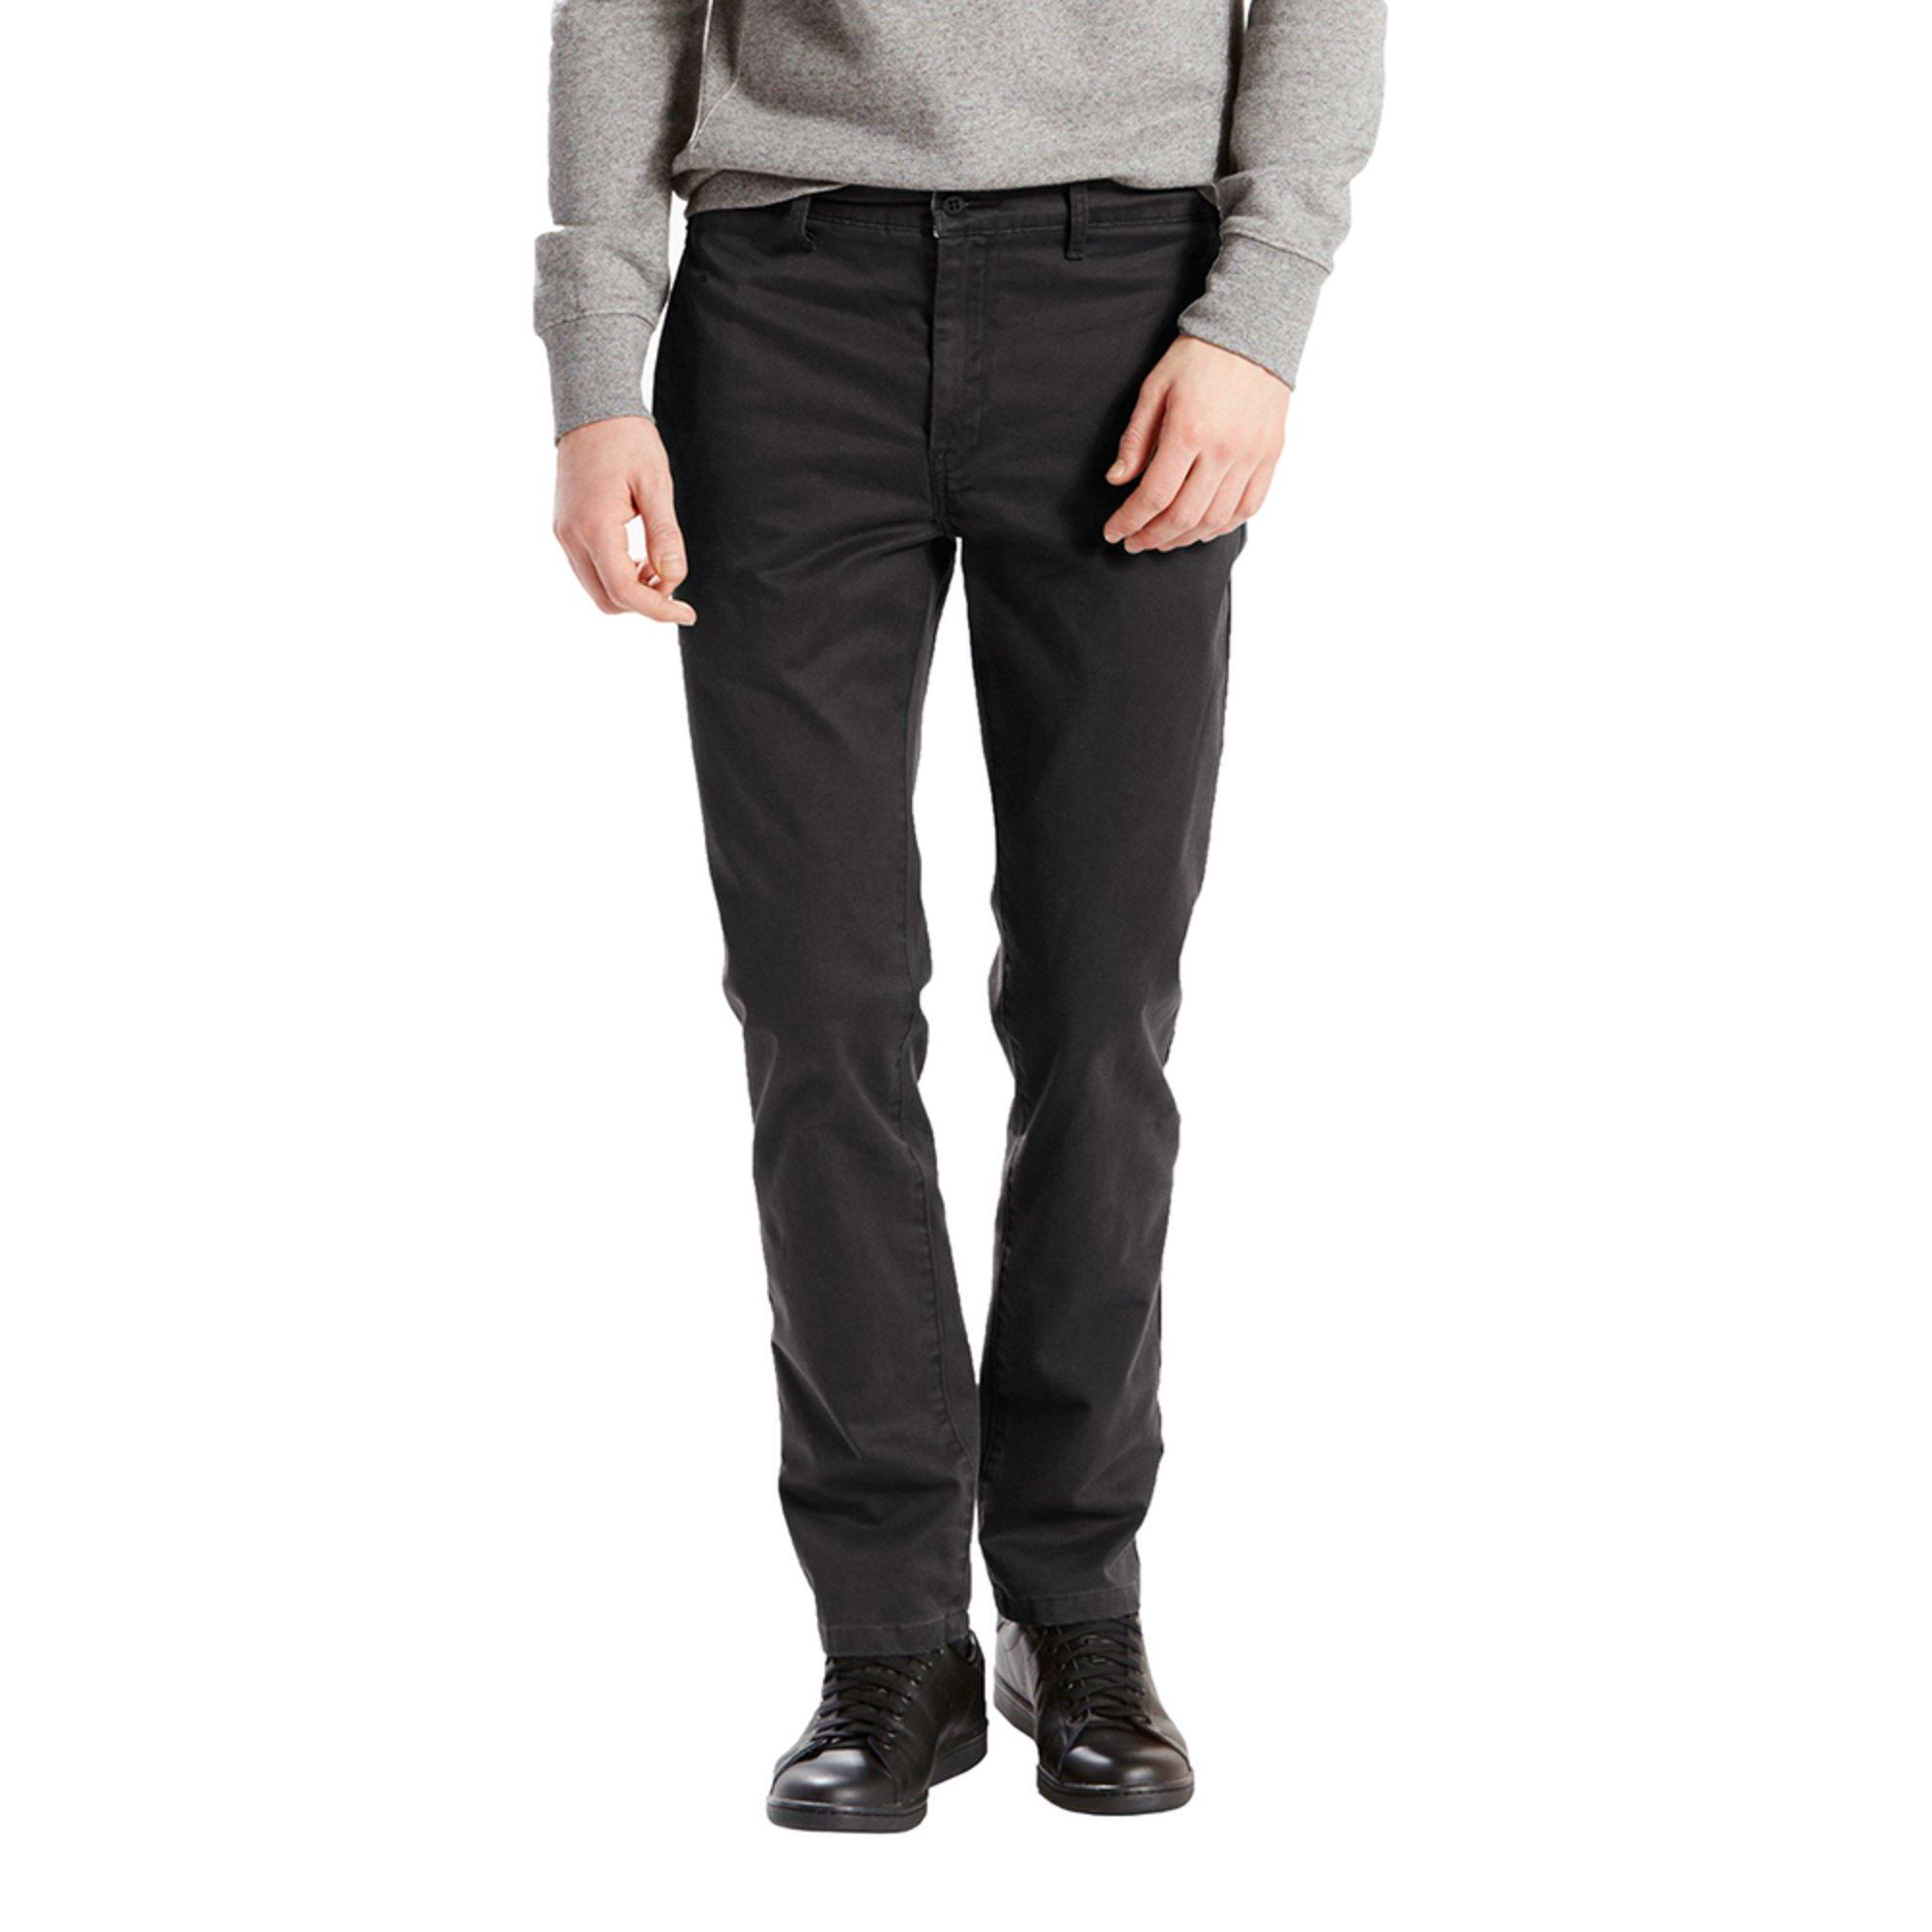 Twill Pants Fit Dress Men's amp; Casual Chino 511 Levi's Slim RXgnq